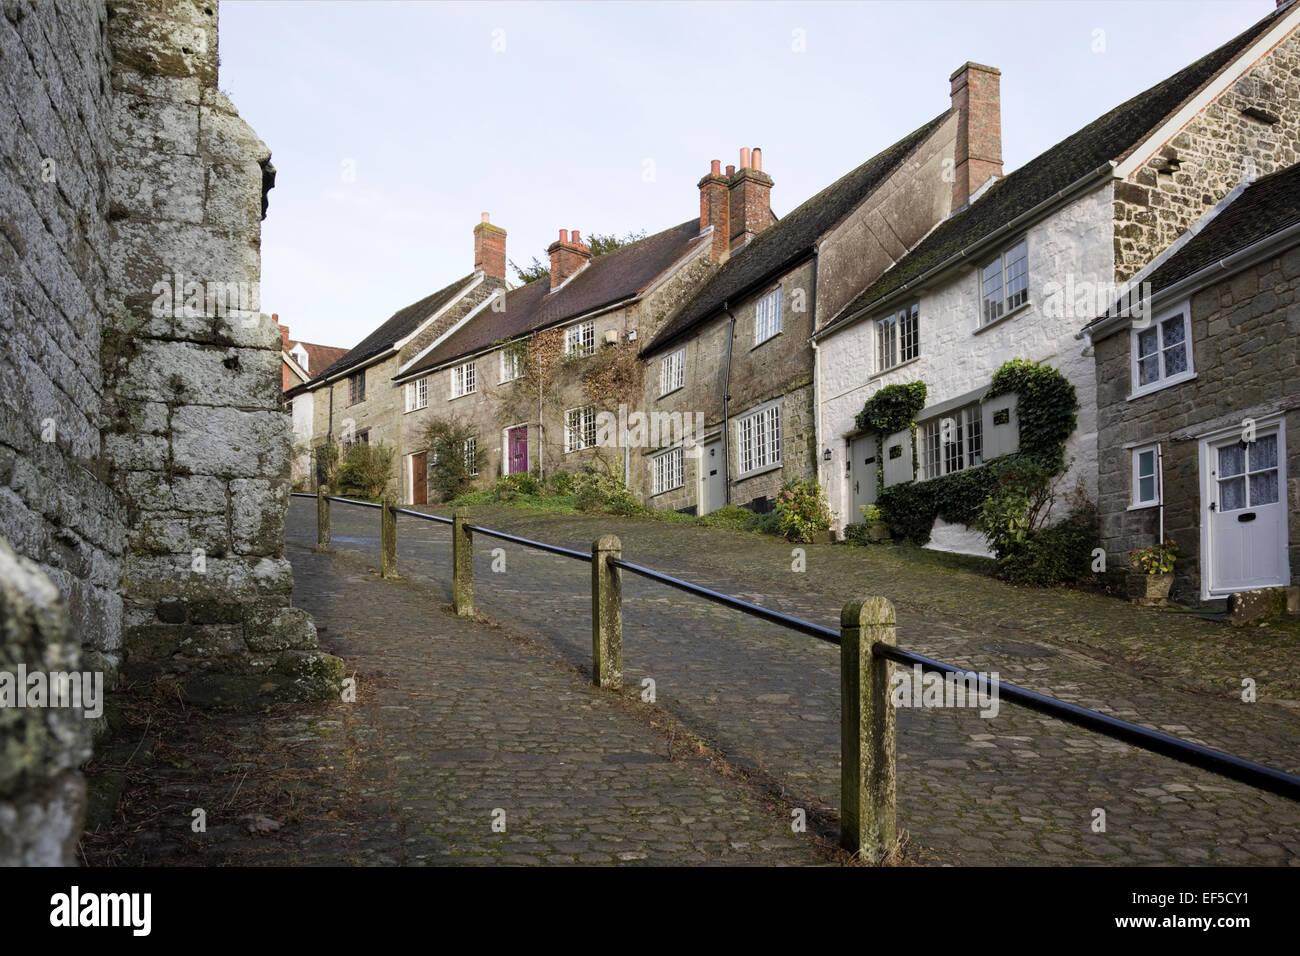 Classic English cobbled street, Shaftesbury, Gold Hill, Dorset - Stock Image